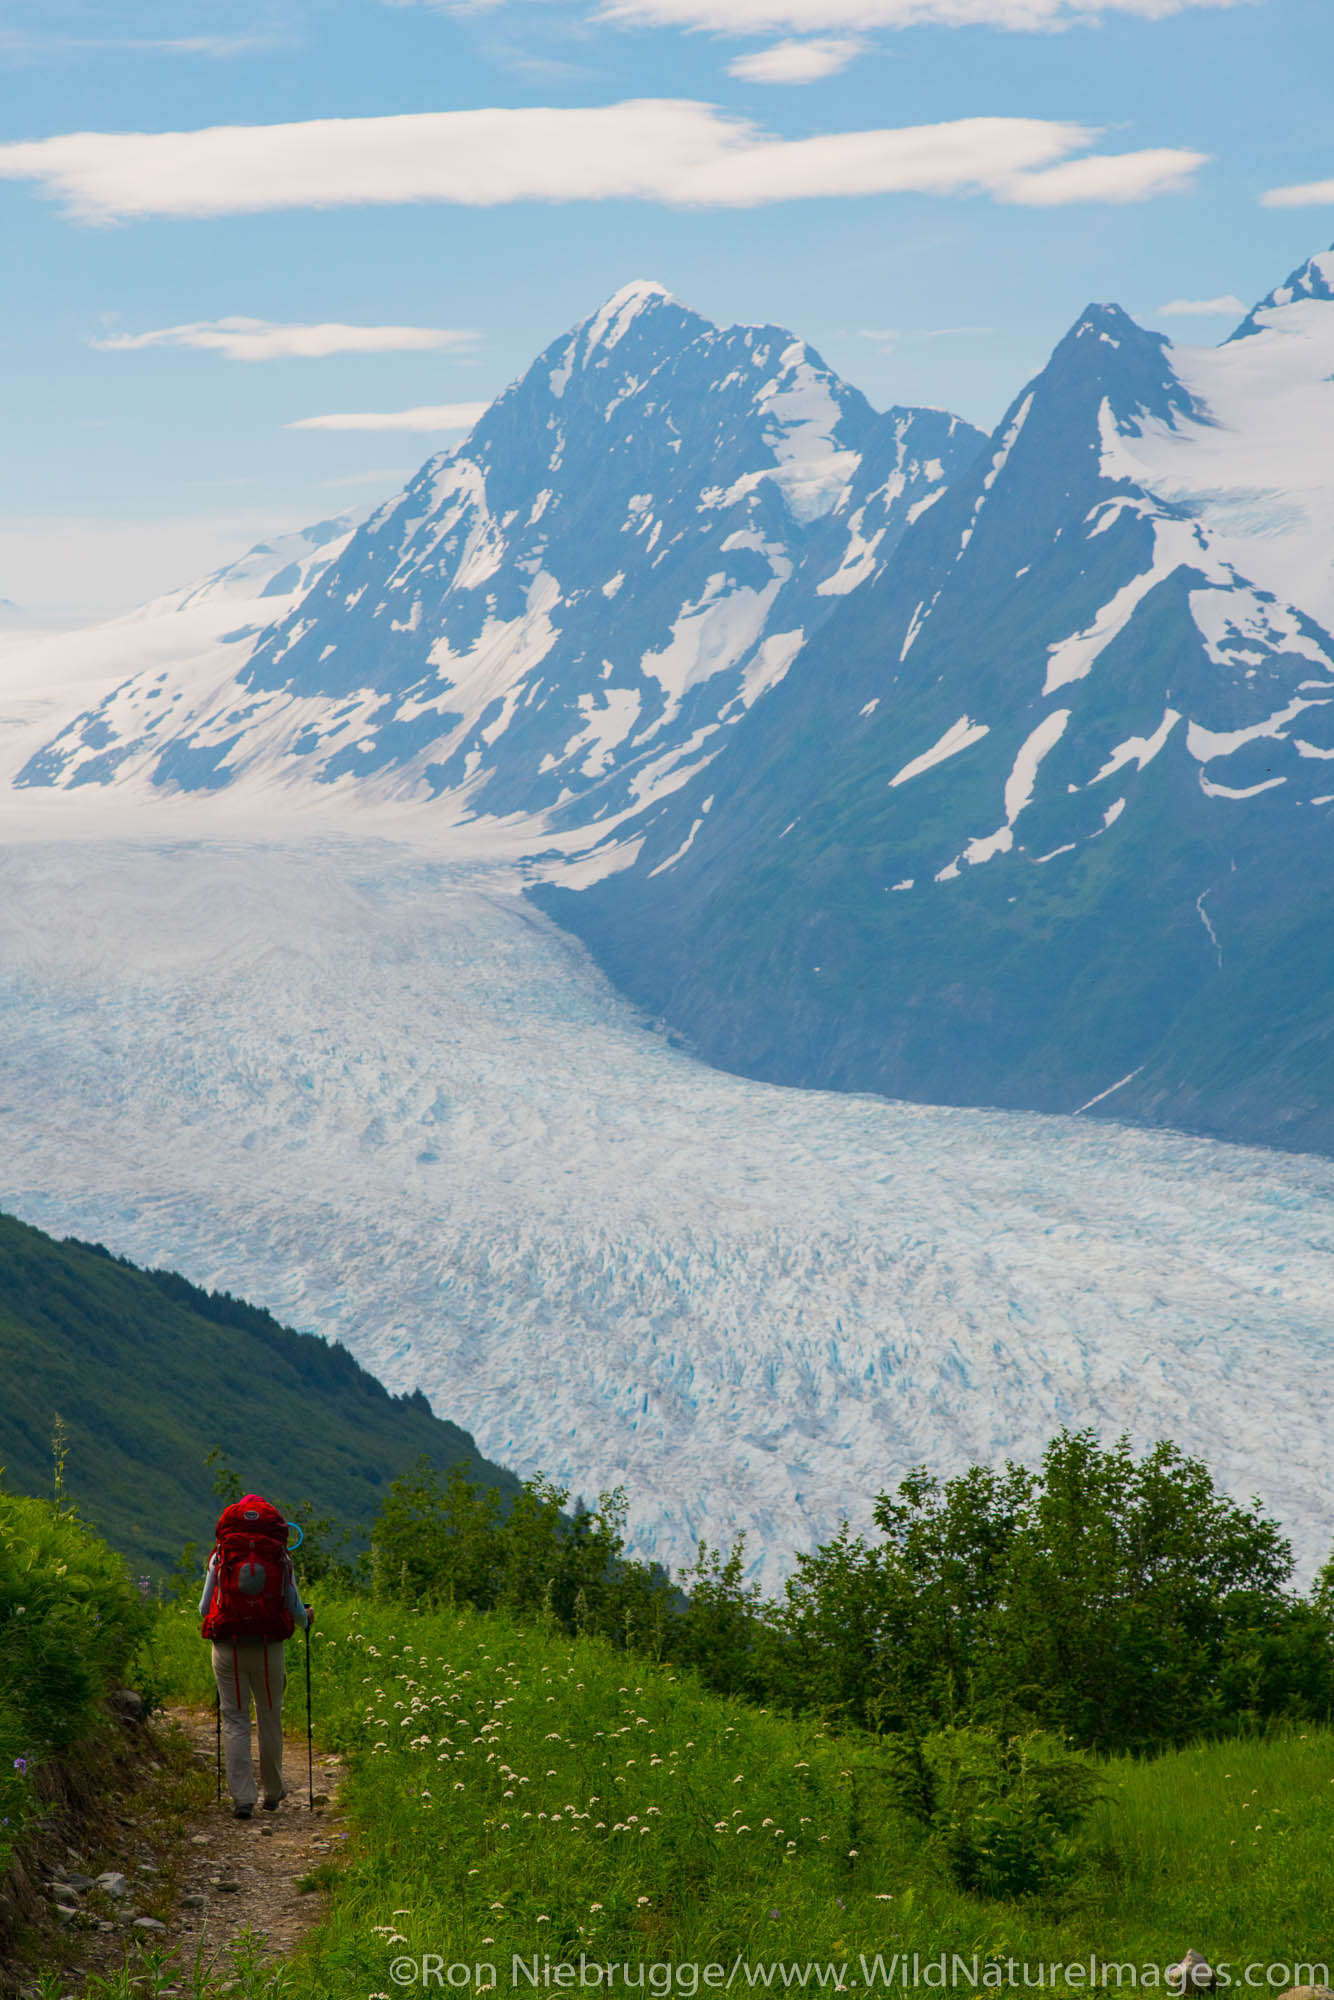 Backpacking to the Spencer Glacier Bench Cabin, Chugach National Forest, Alaska.